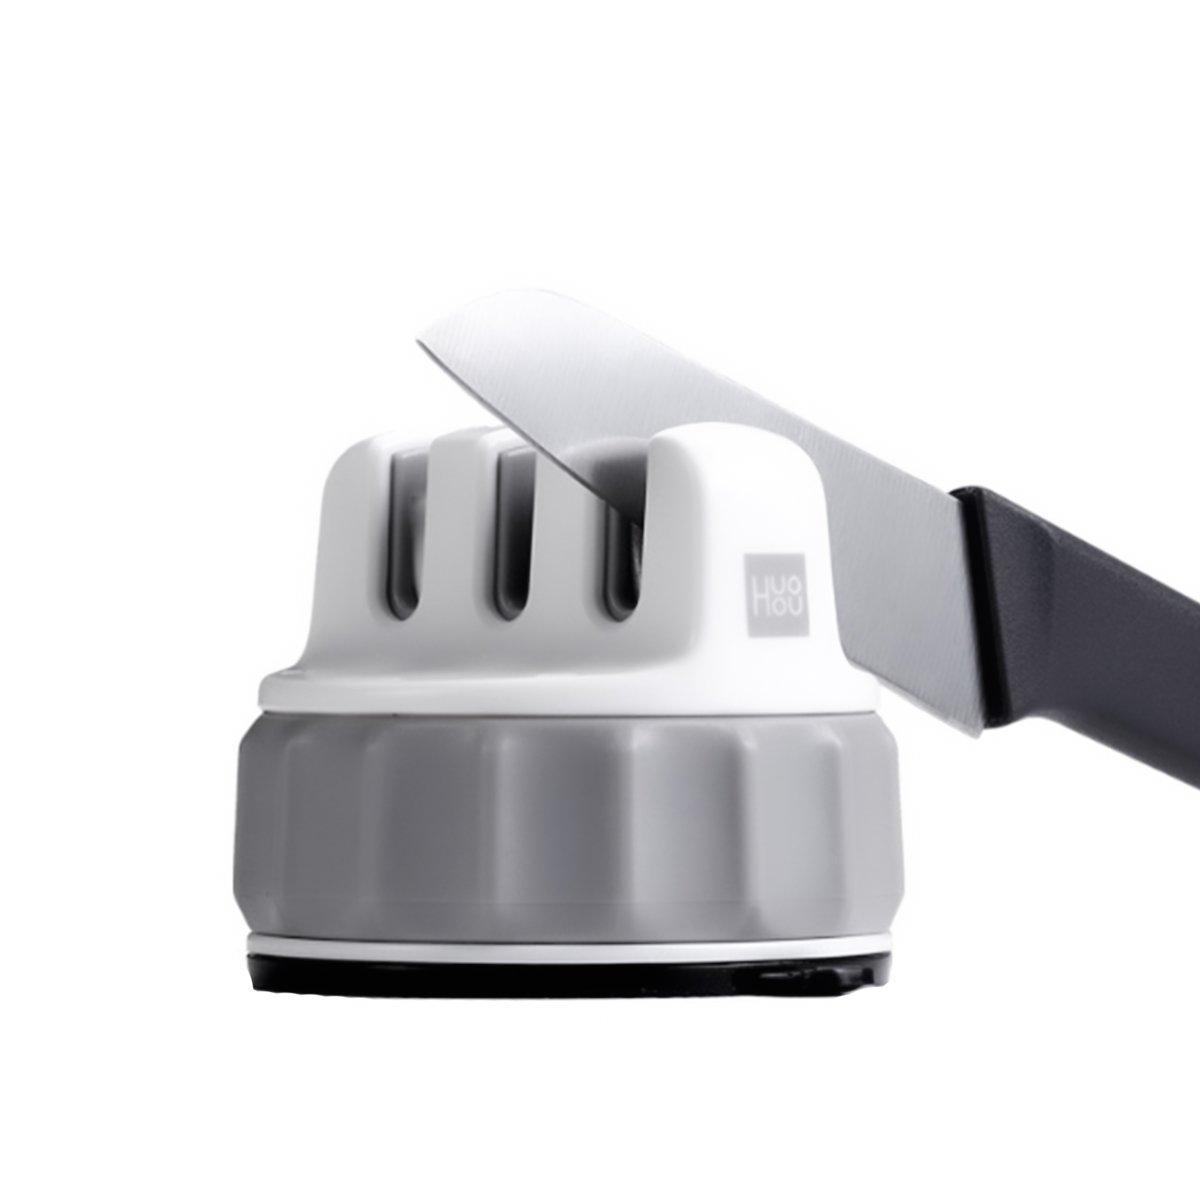 Точилка для ножей Xiaomi Huohou Mini Knife Sharpener, White